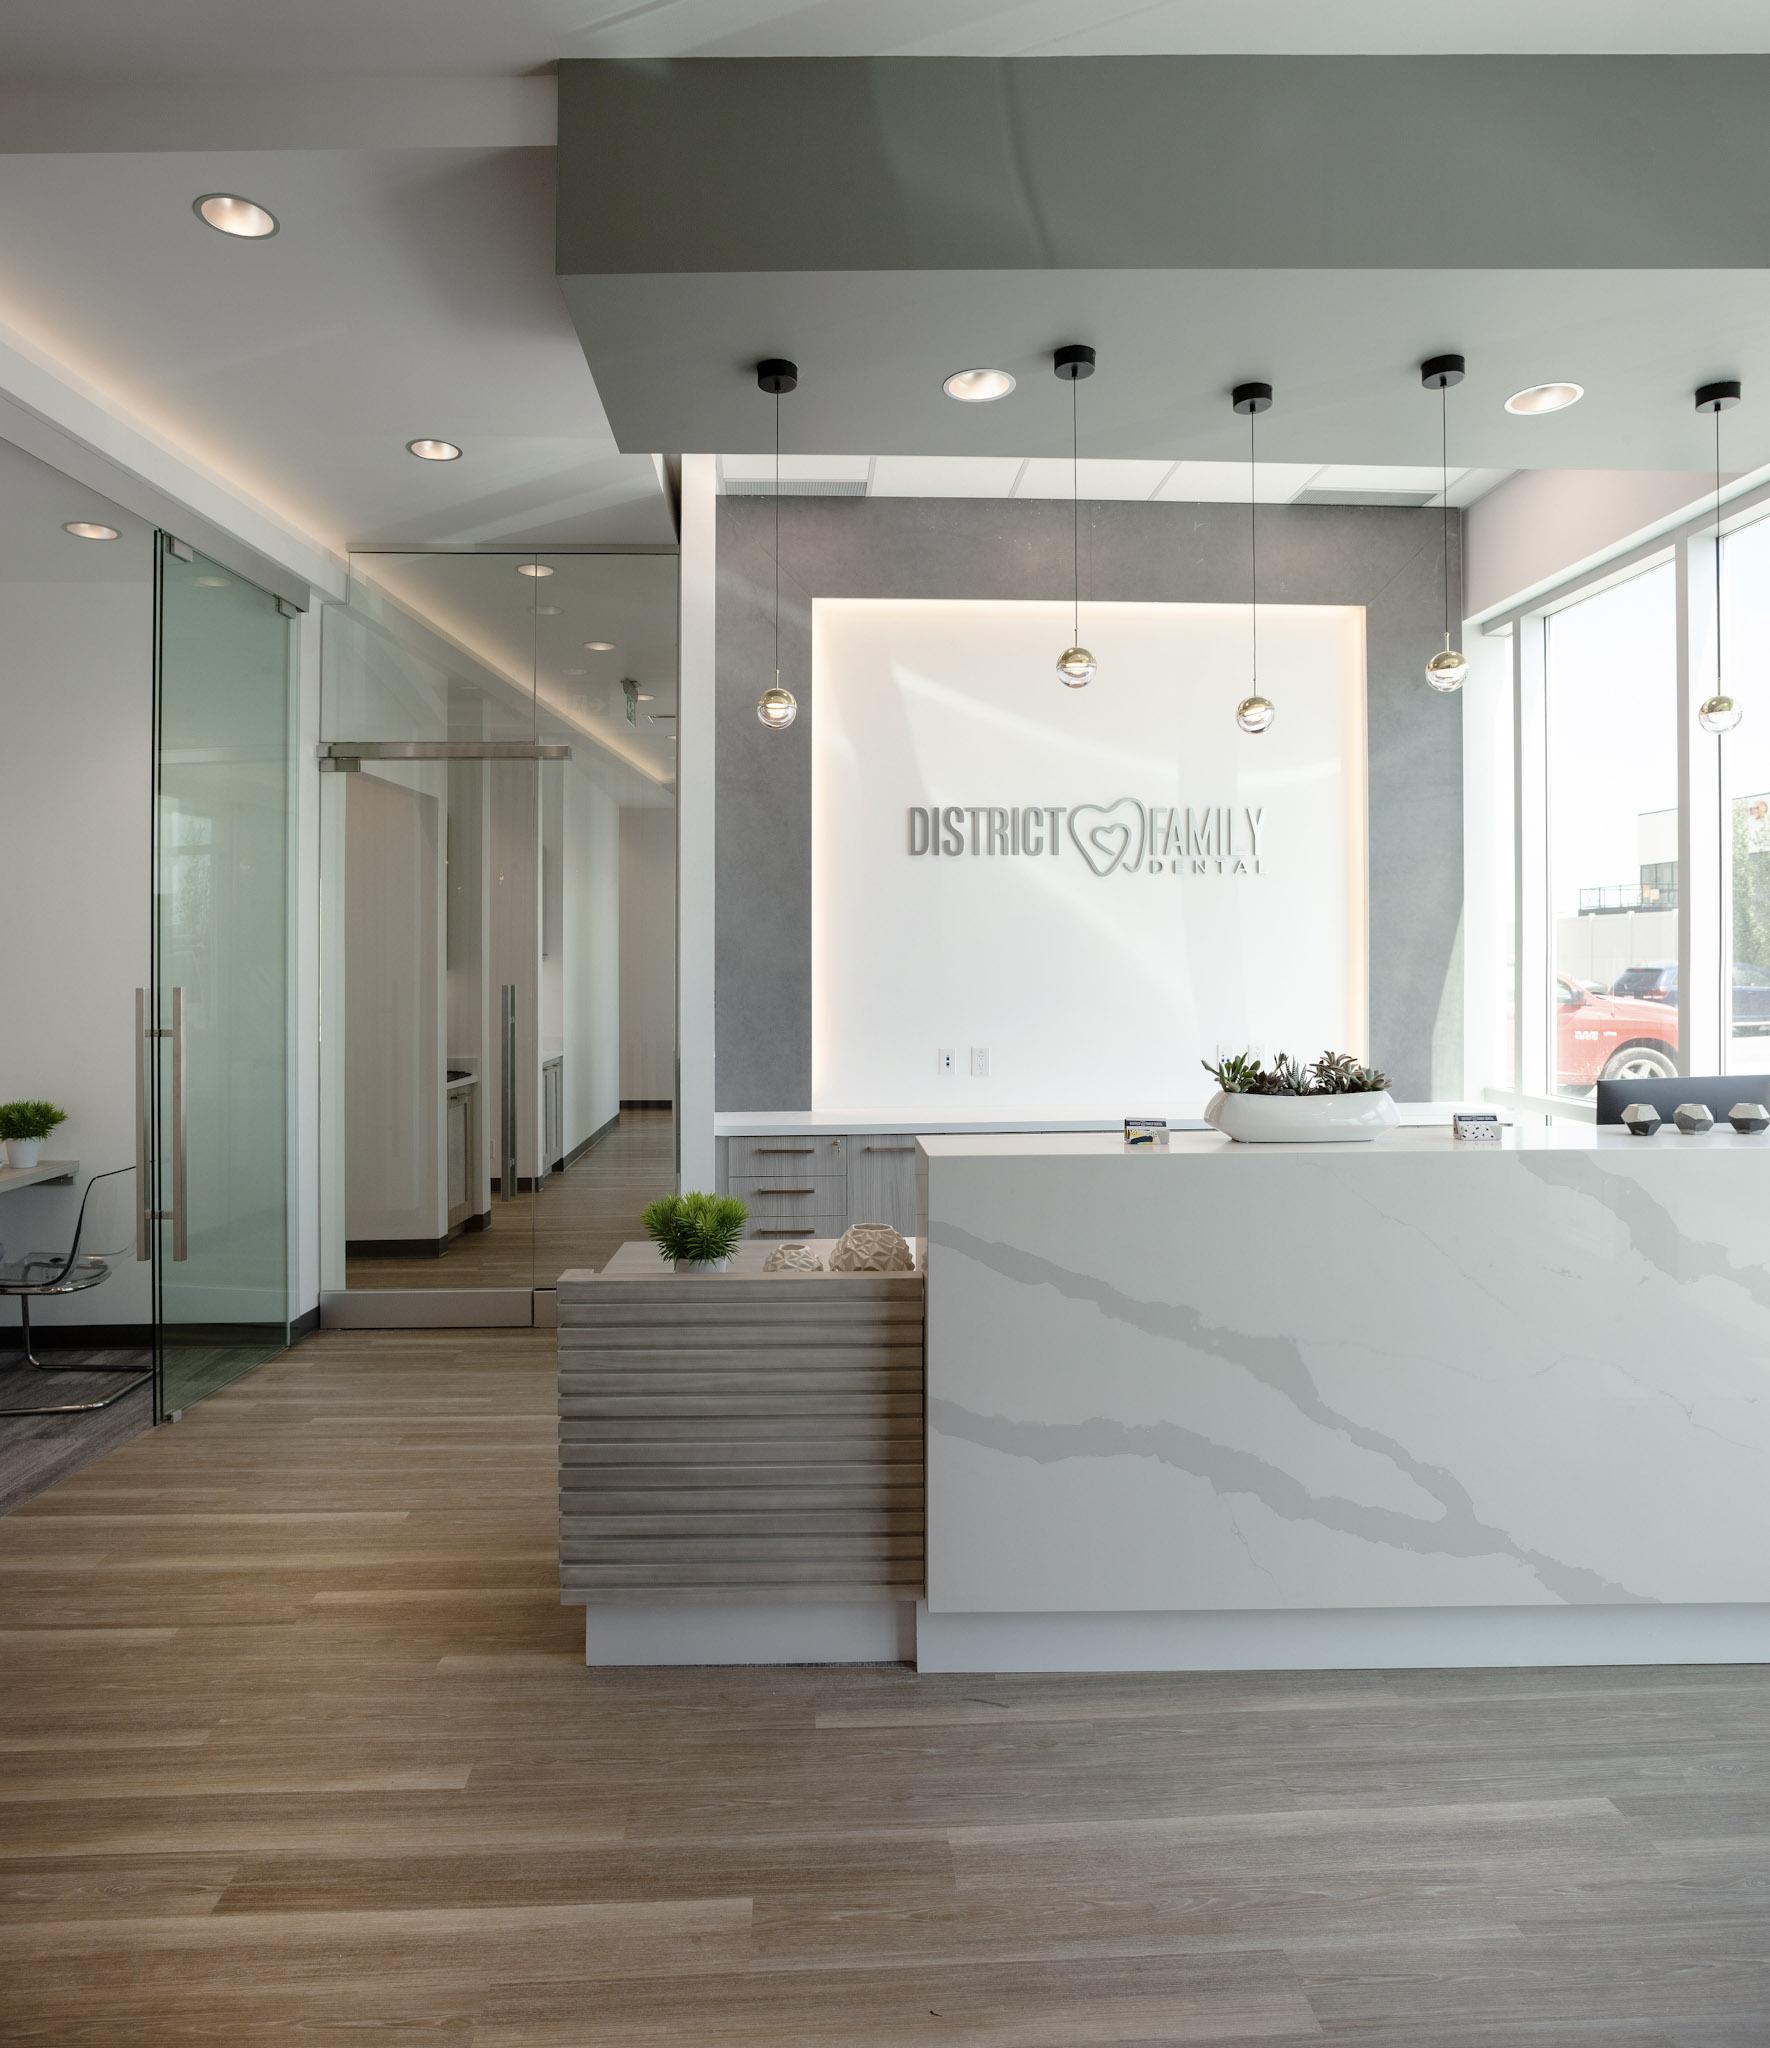 Family district dental Westrose Interiors